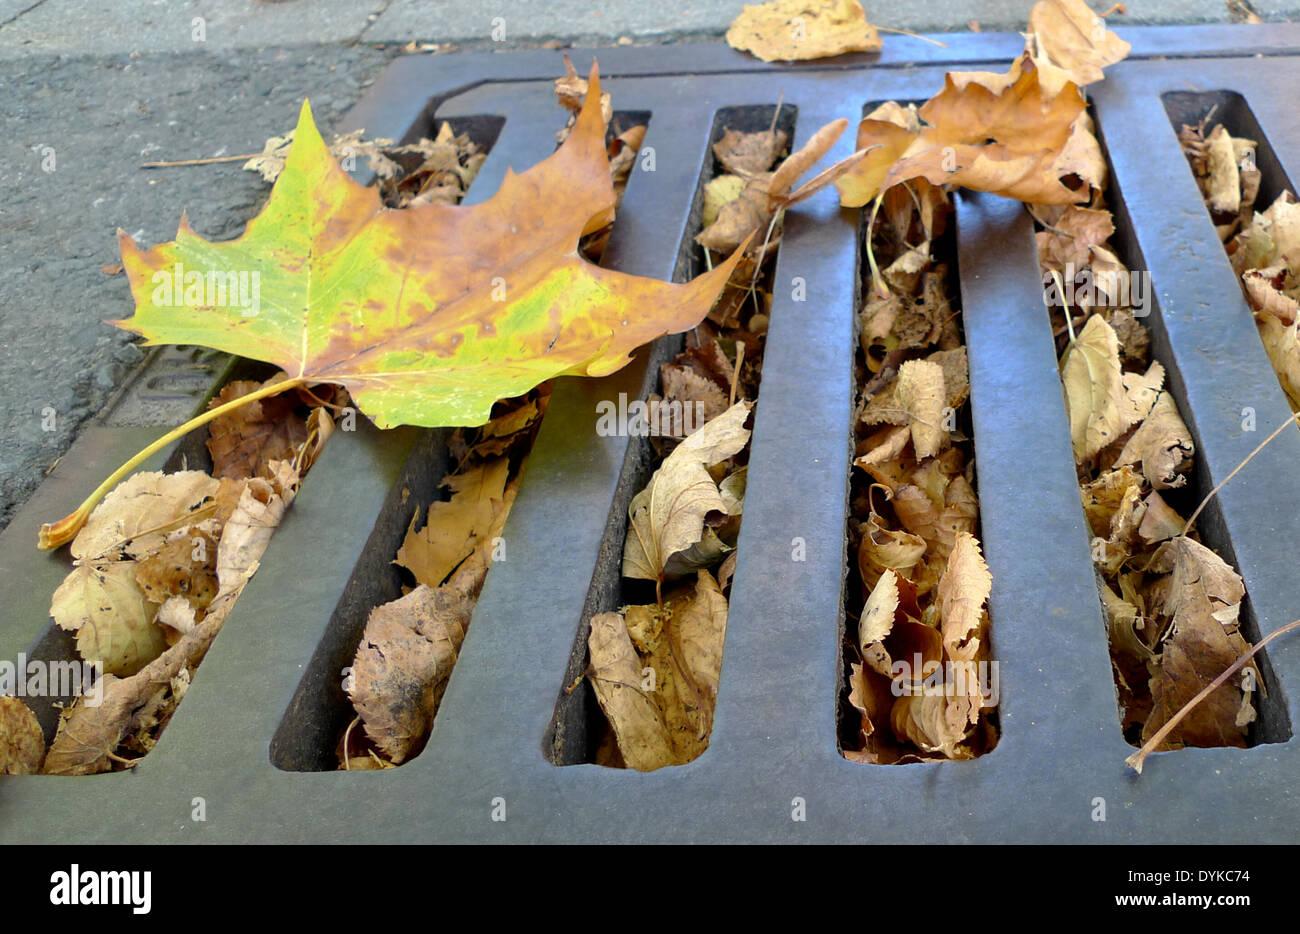 mit Herbstlaub verstopfter Kanaldeckel, blocked gully, mit Herbstlaub verstopfter Kanaldeckel | blocked gully | - Stock Image